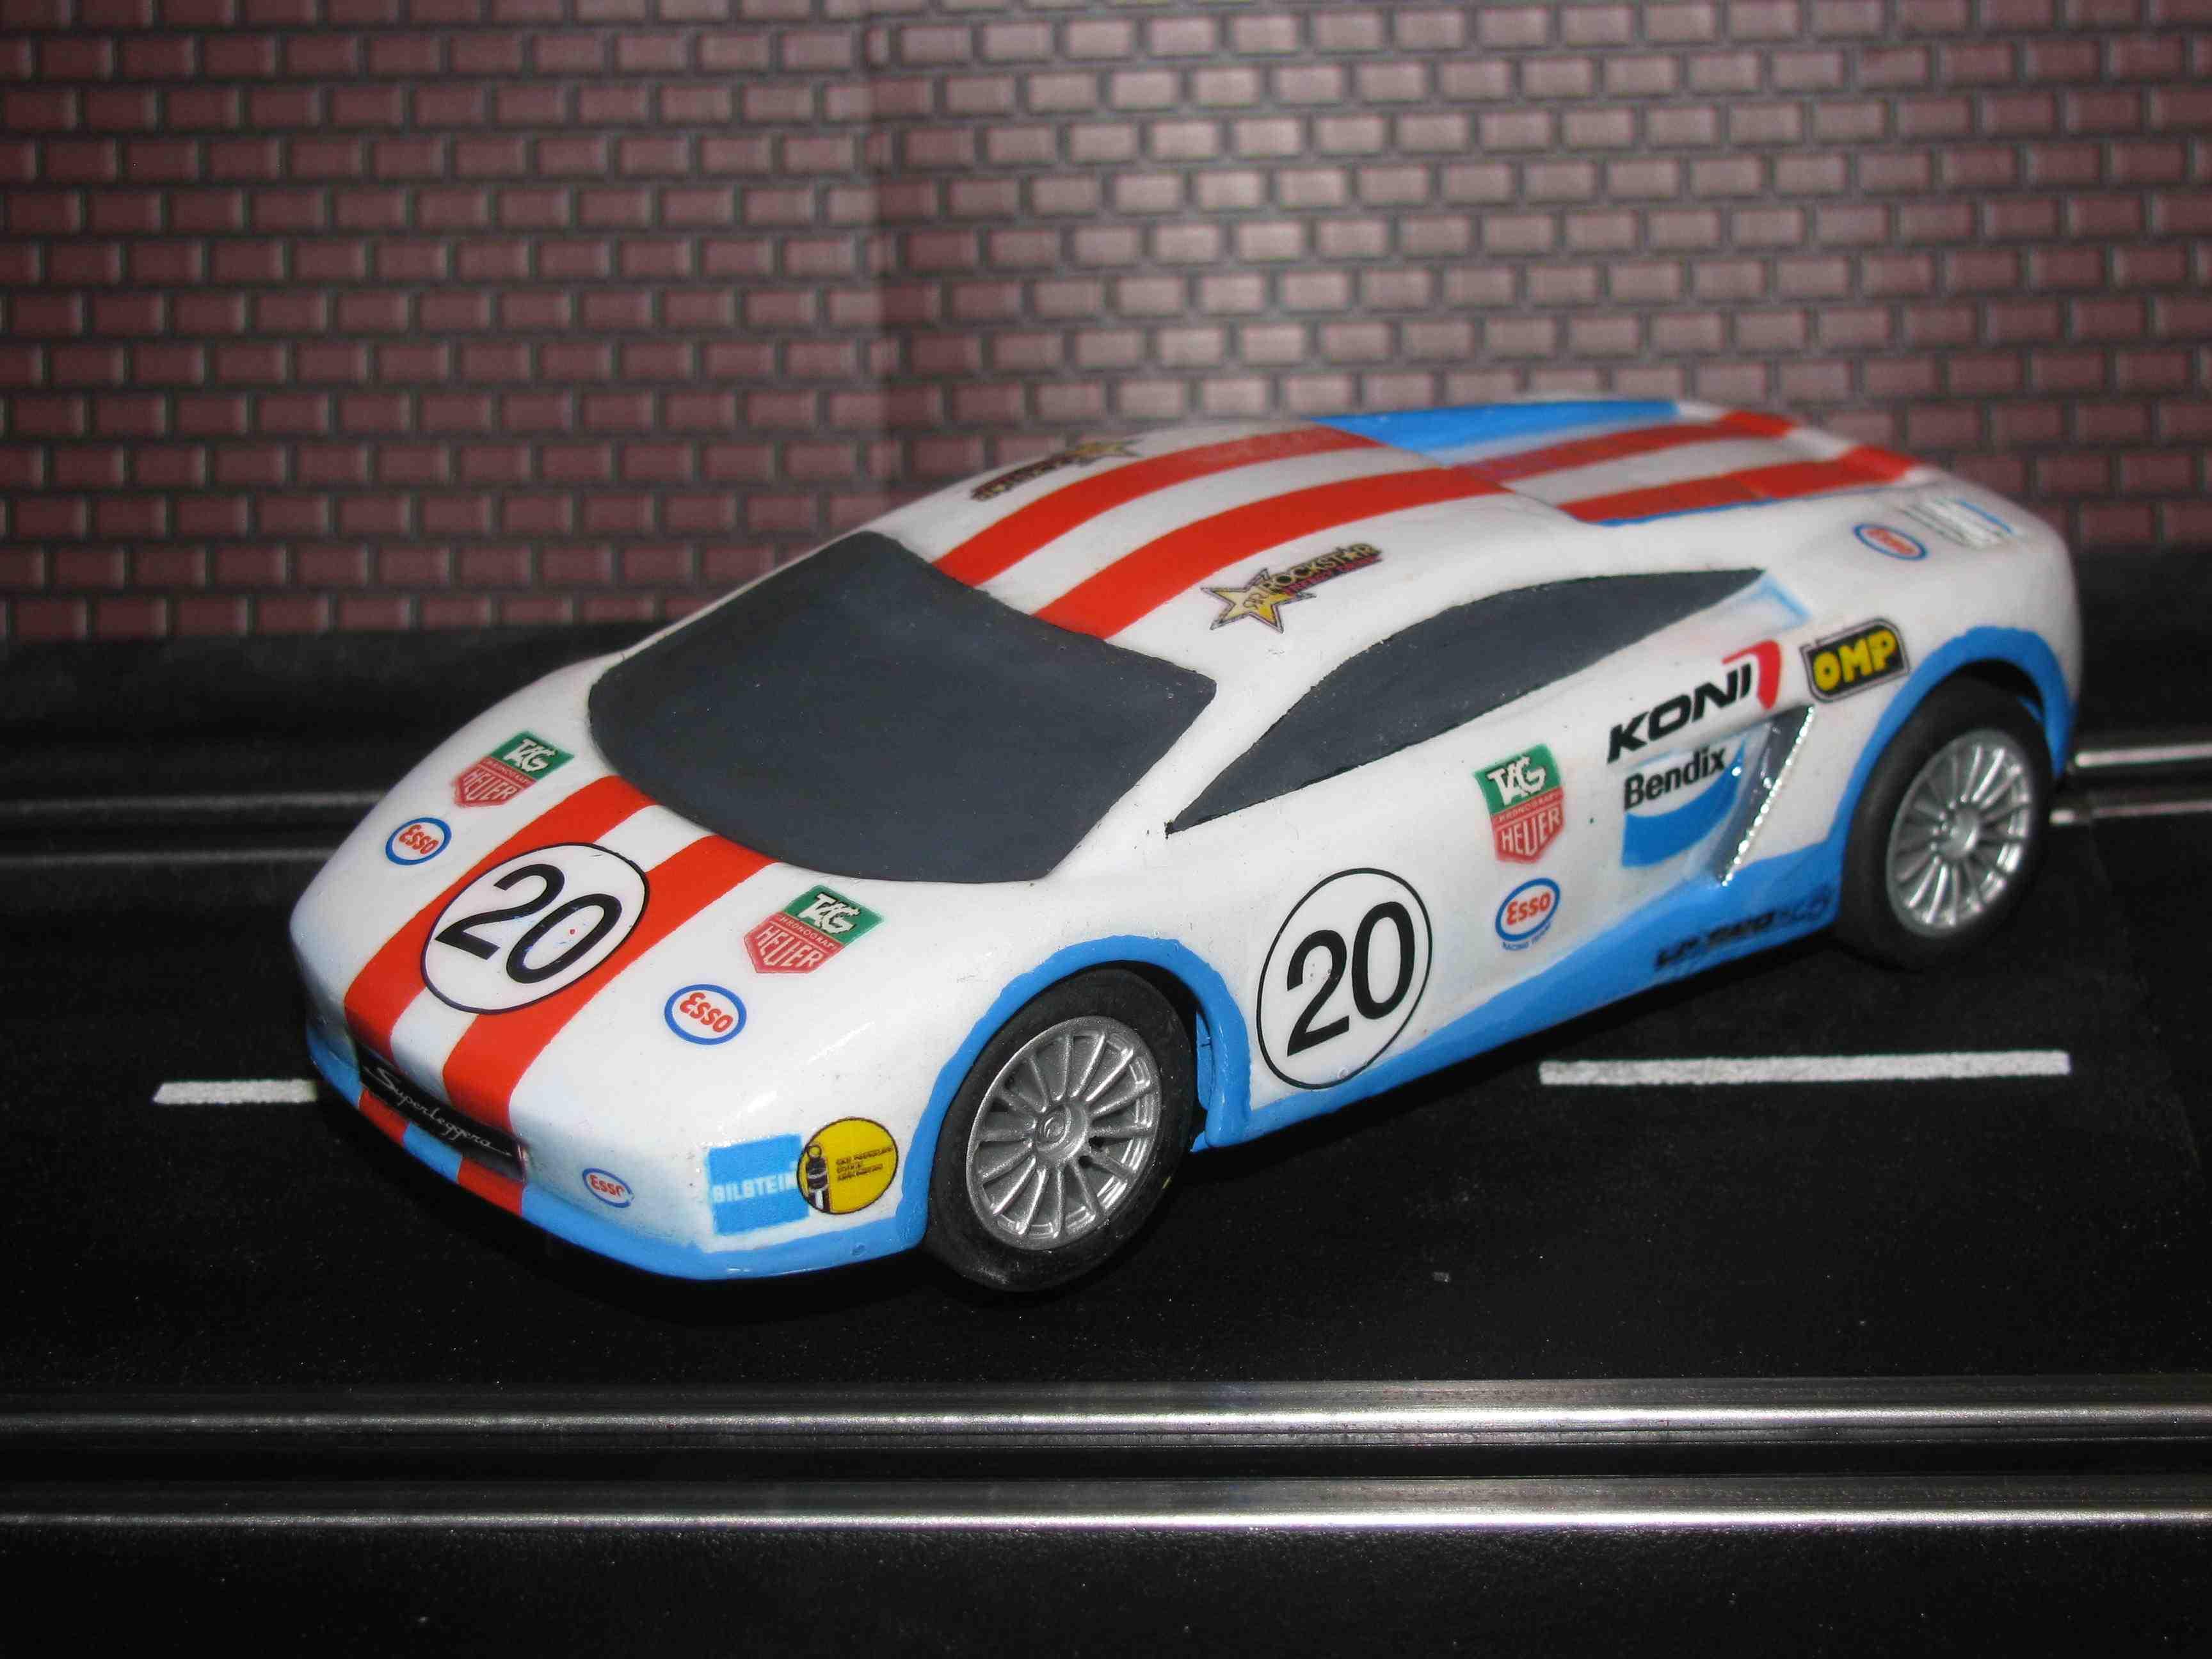 * SOLD * Scalextric/Hornby Lamborghini Gallardo Supperleggera slot car 1/32 – Car 20